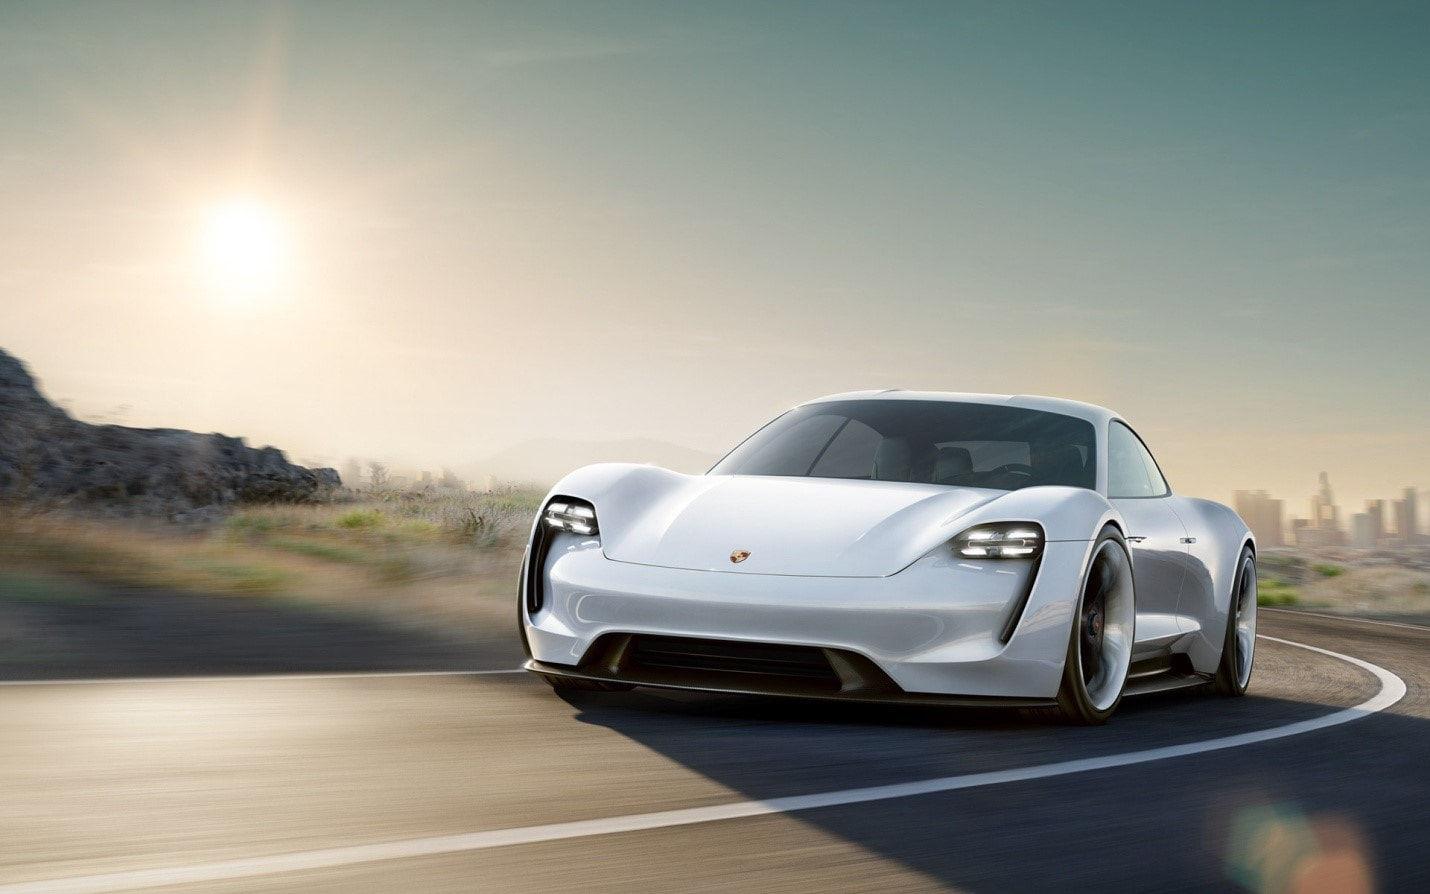 The Electric Soul of Porsche – The Porsche Taycan